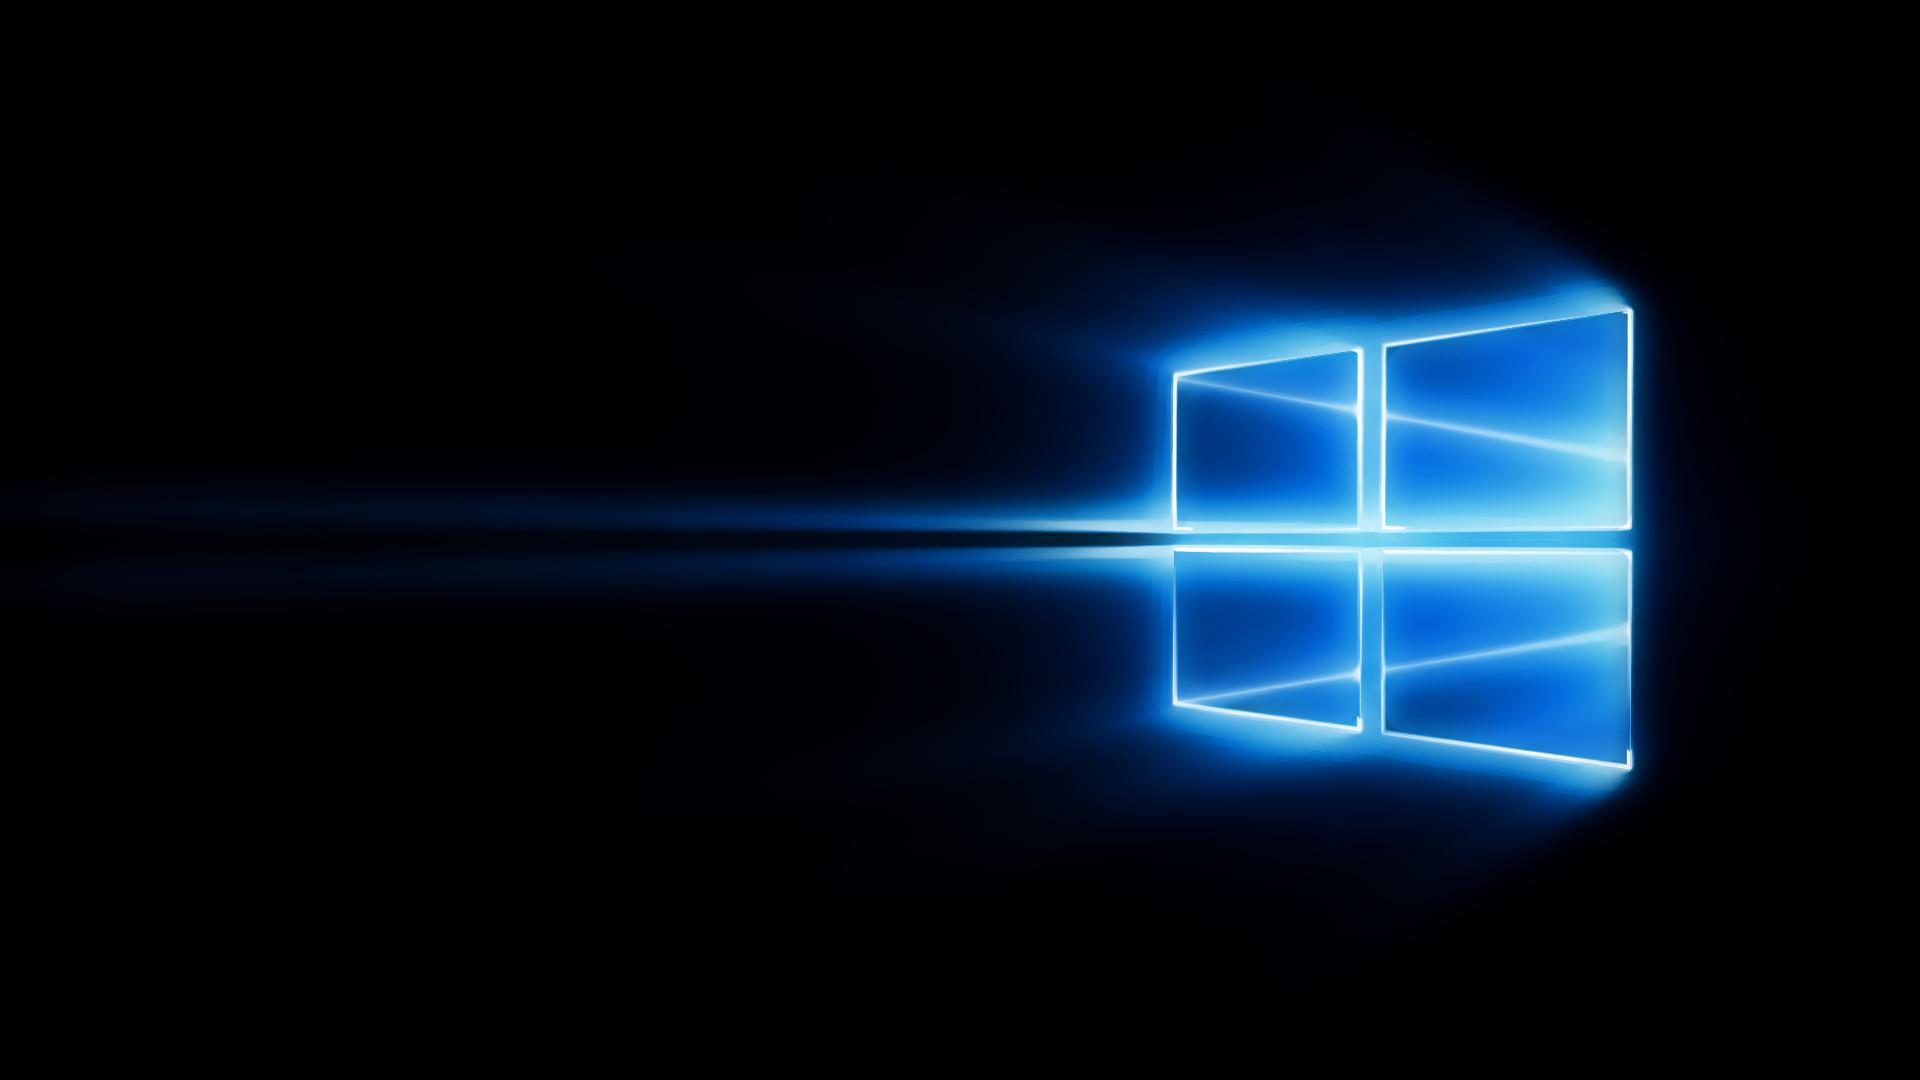 HD Windows 10 Wallpaper   HD Wallpapers Pulse